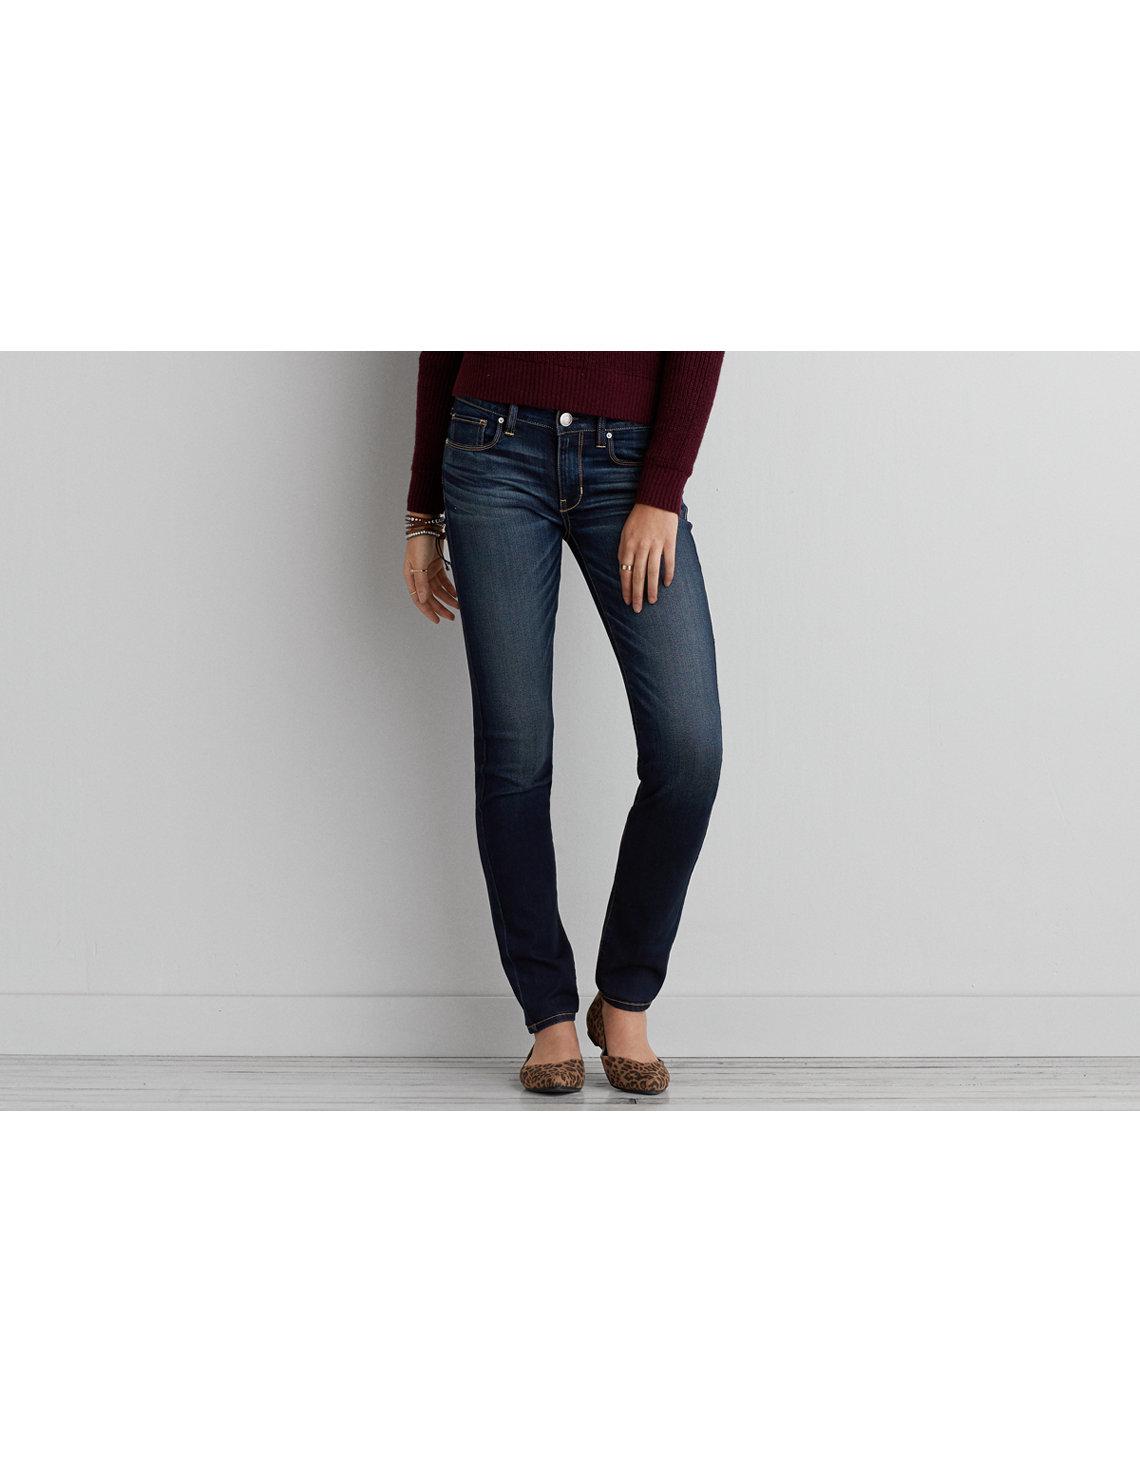 AE Denim X Skinny Jean - Indigo Super Skinny Jeans American Eagle Outfitters